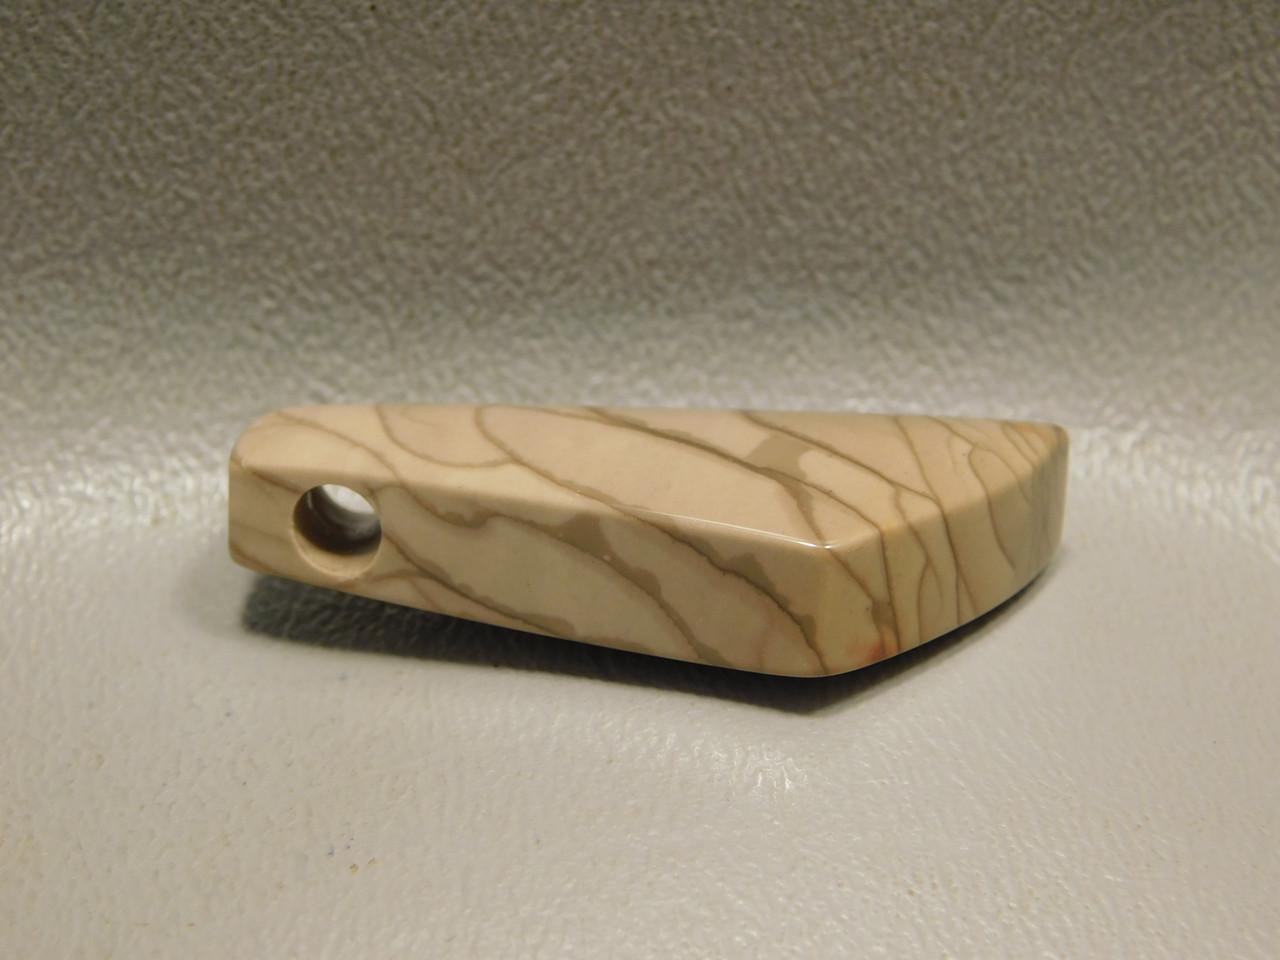 Willow Creek Jasper Drilled Stone Bead Pendant #4